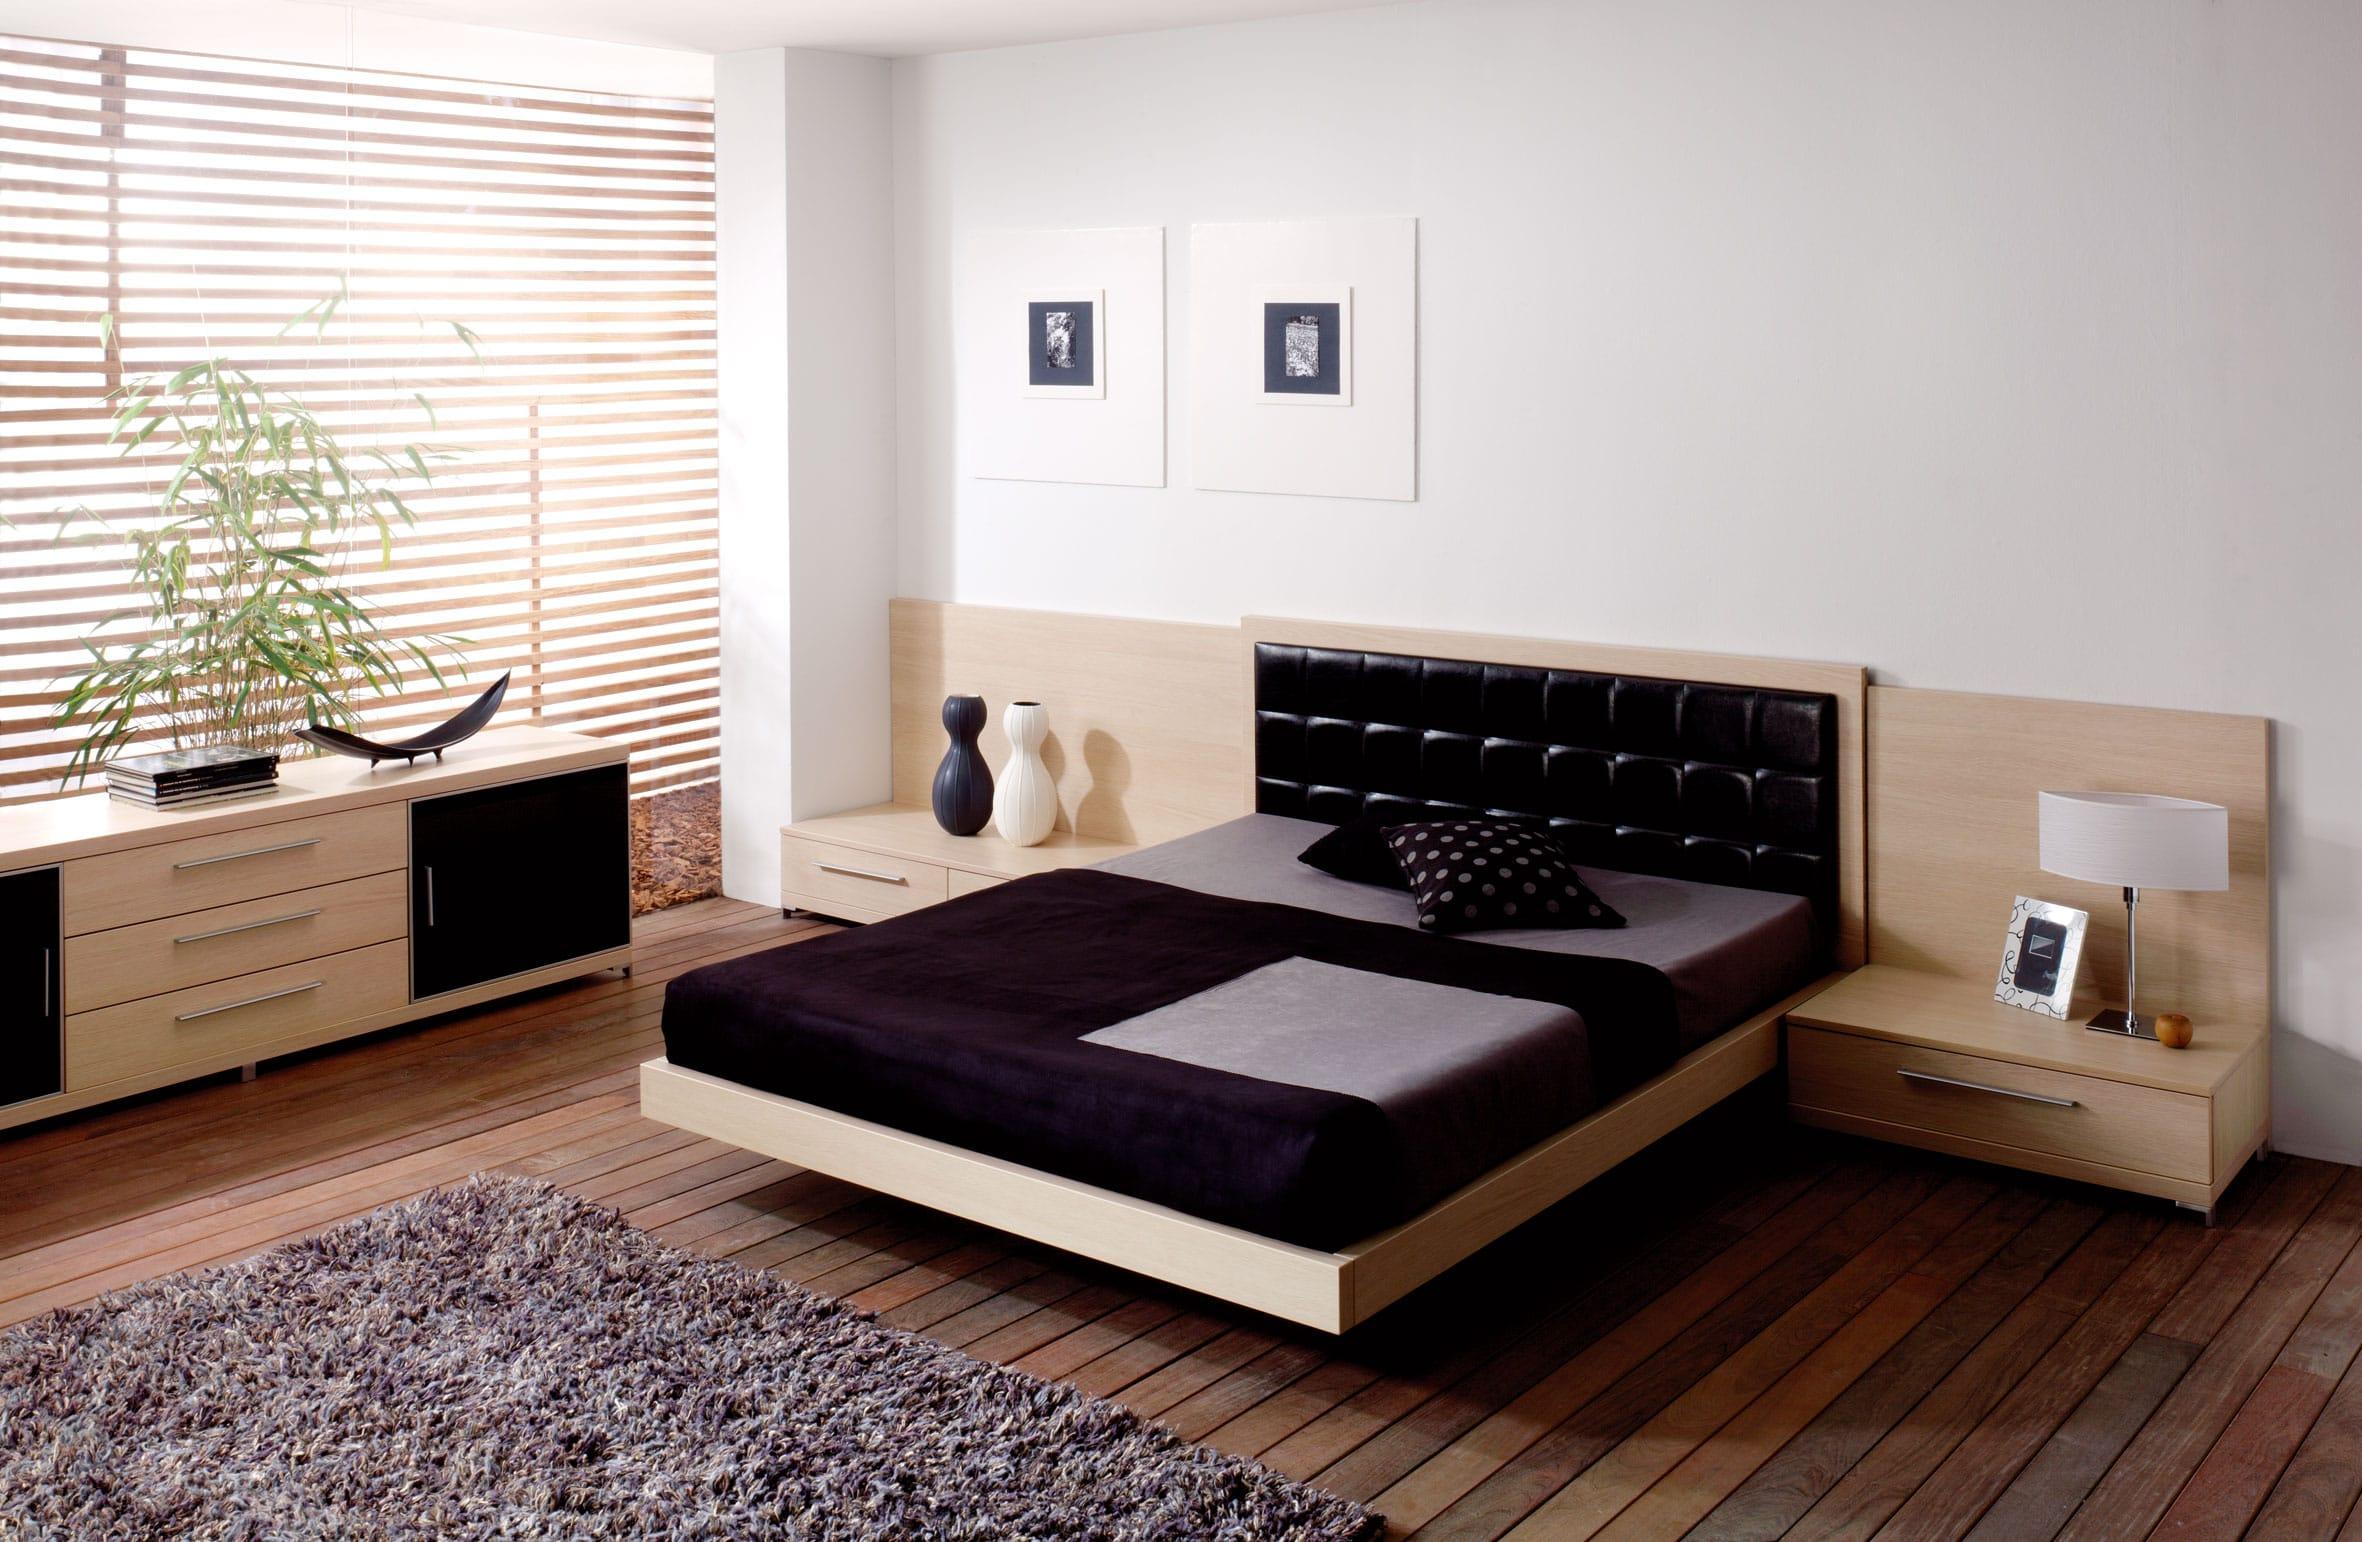 Dormitorio matrimonio dise o a medida casa dise o for Medidas dormitorio matrimonio